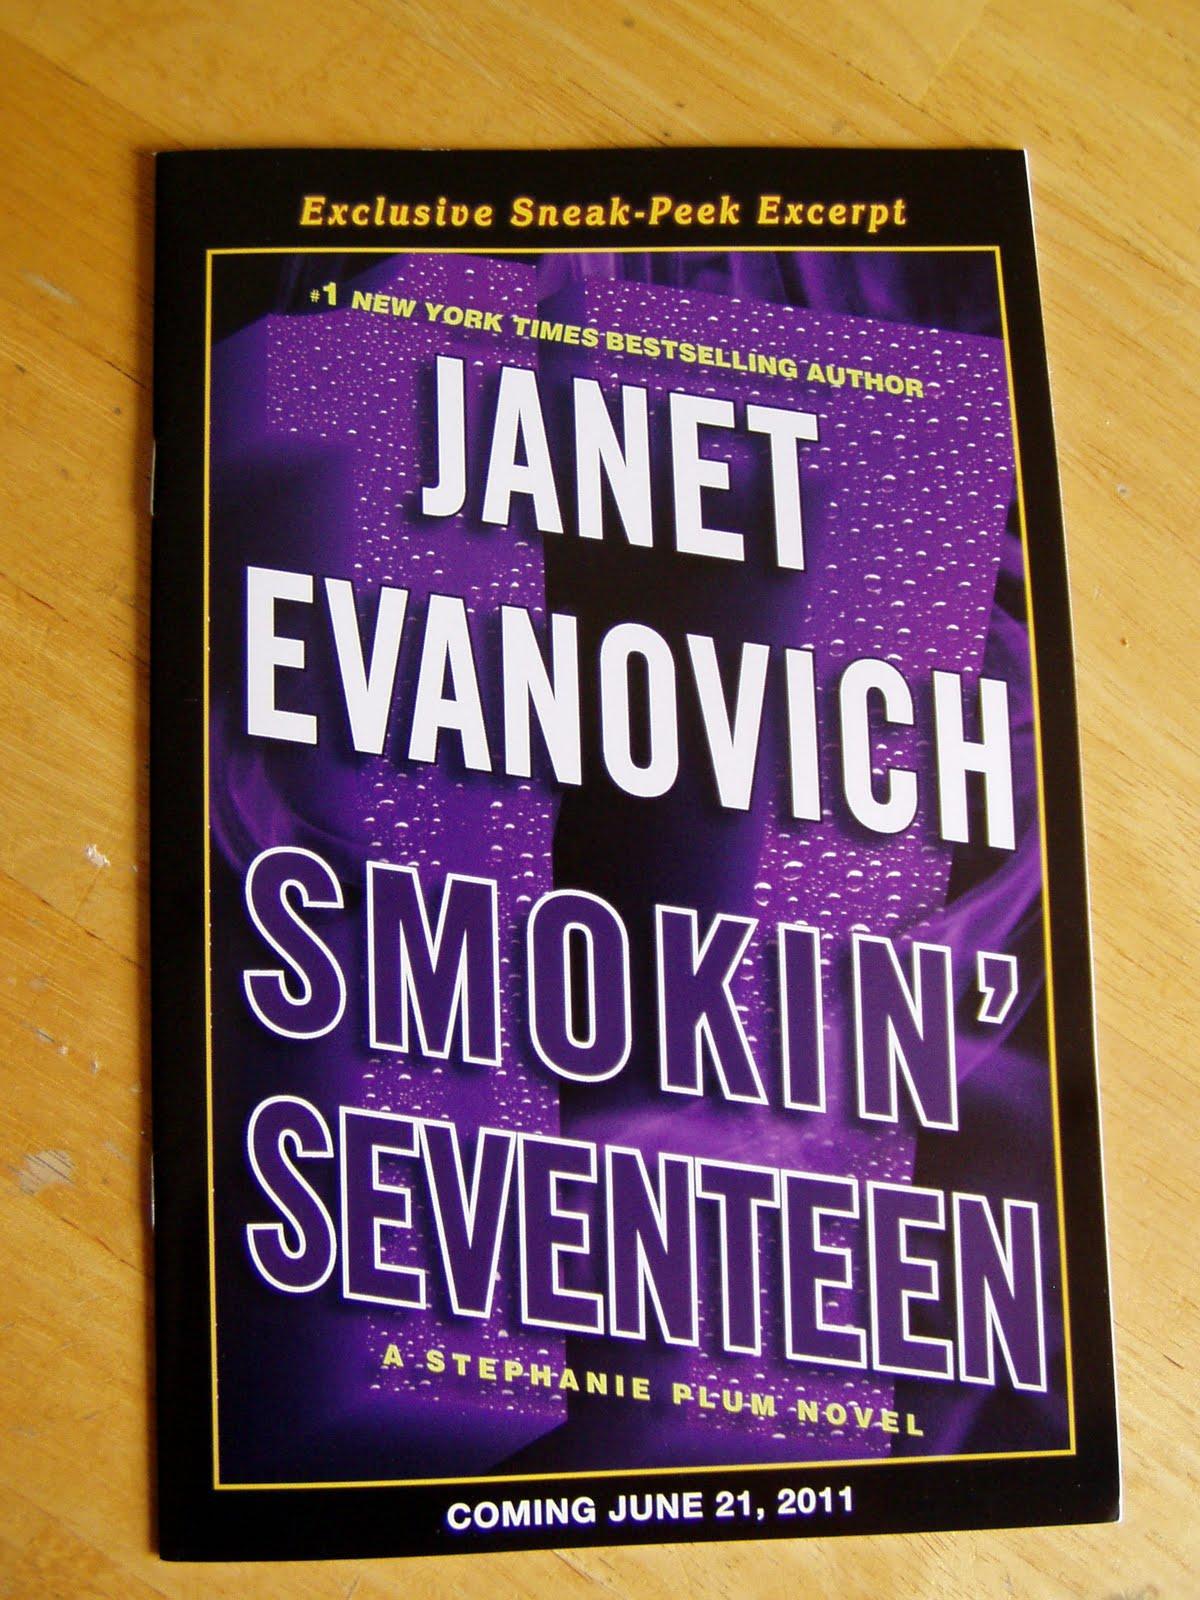 Lot of 5 Janet Evanovich books Stephanie Plum # 5, 6, 8, 17, and 22 paperback VG+